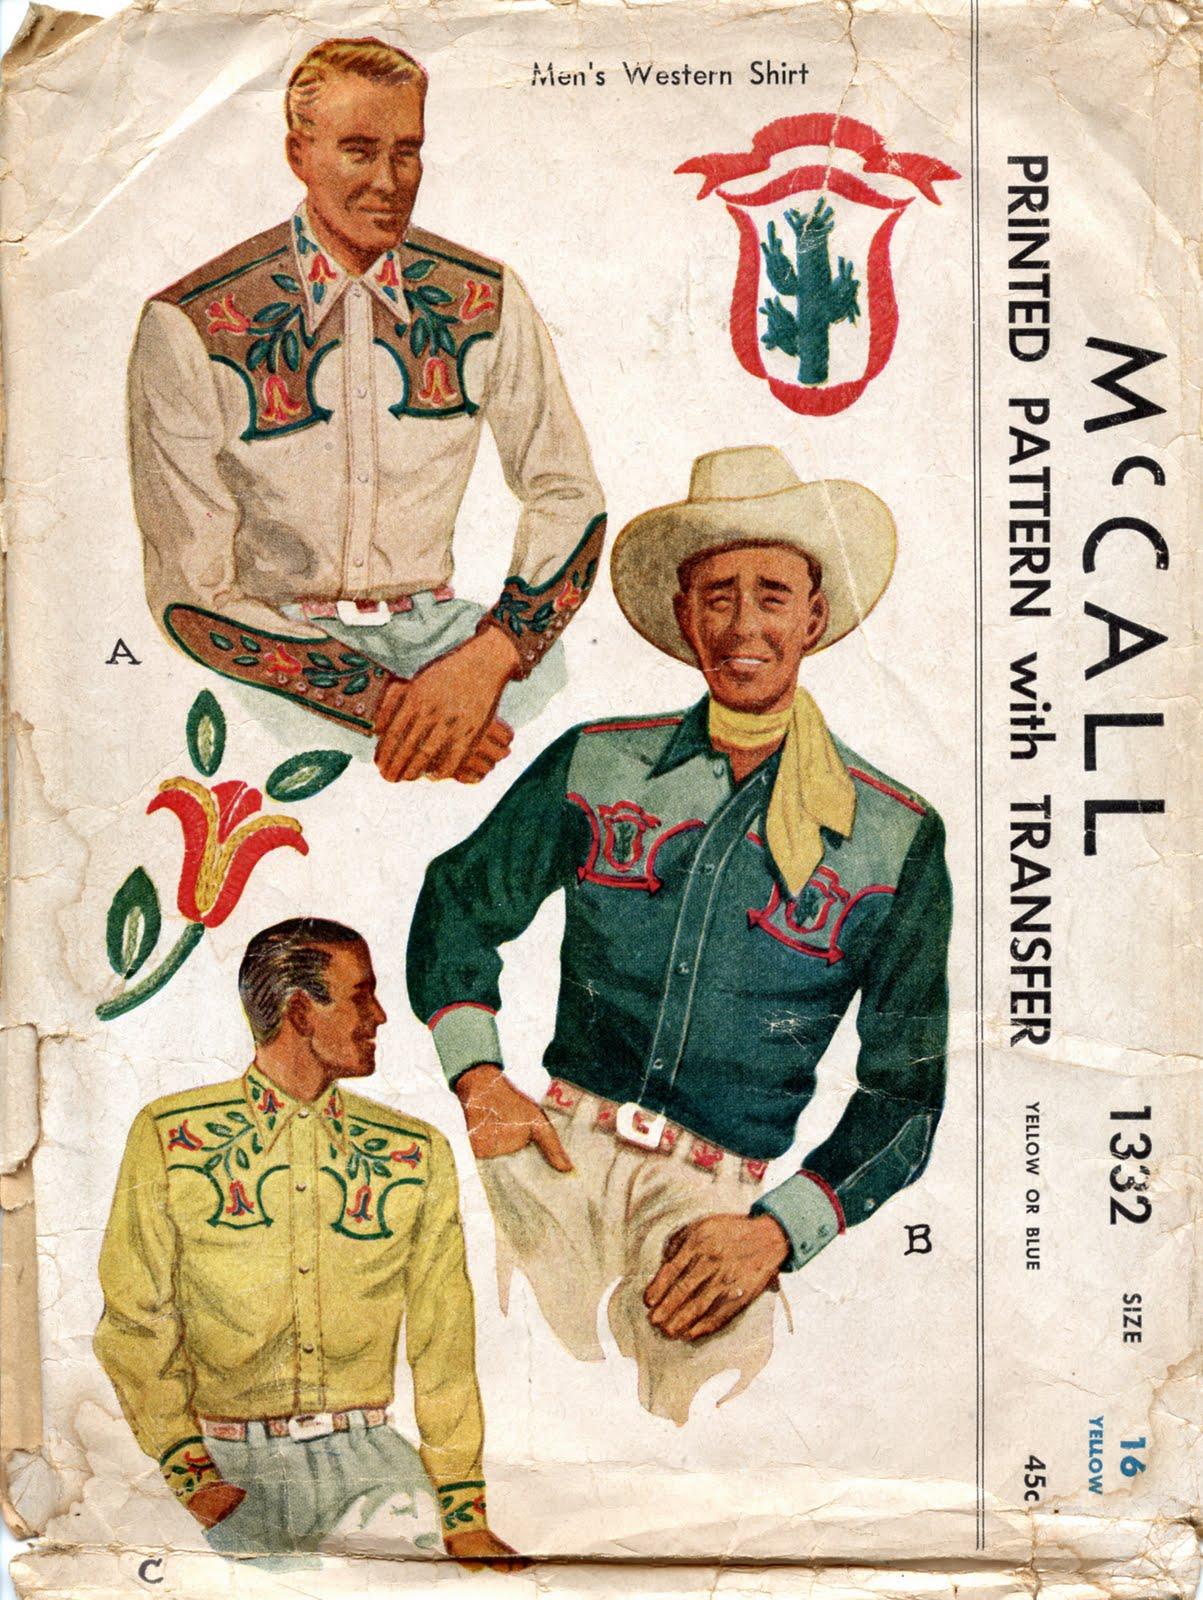 Unsung Sewing Patterns: McCall 1332 - Men's Western Shirt